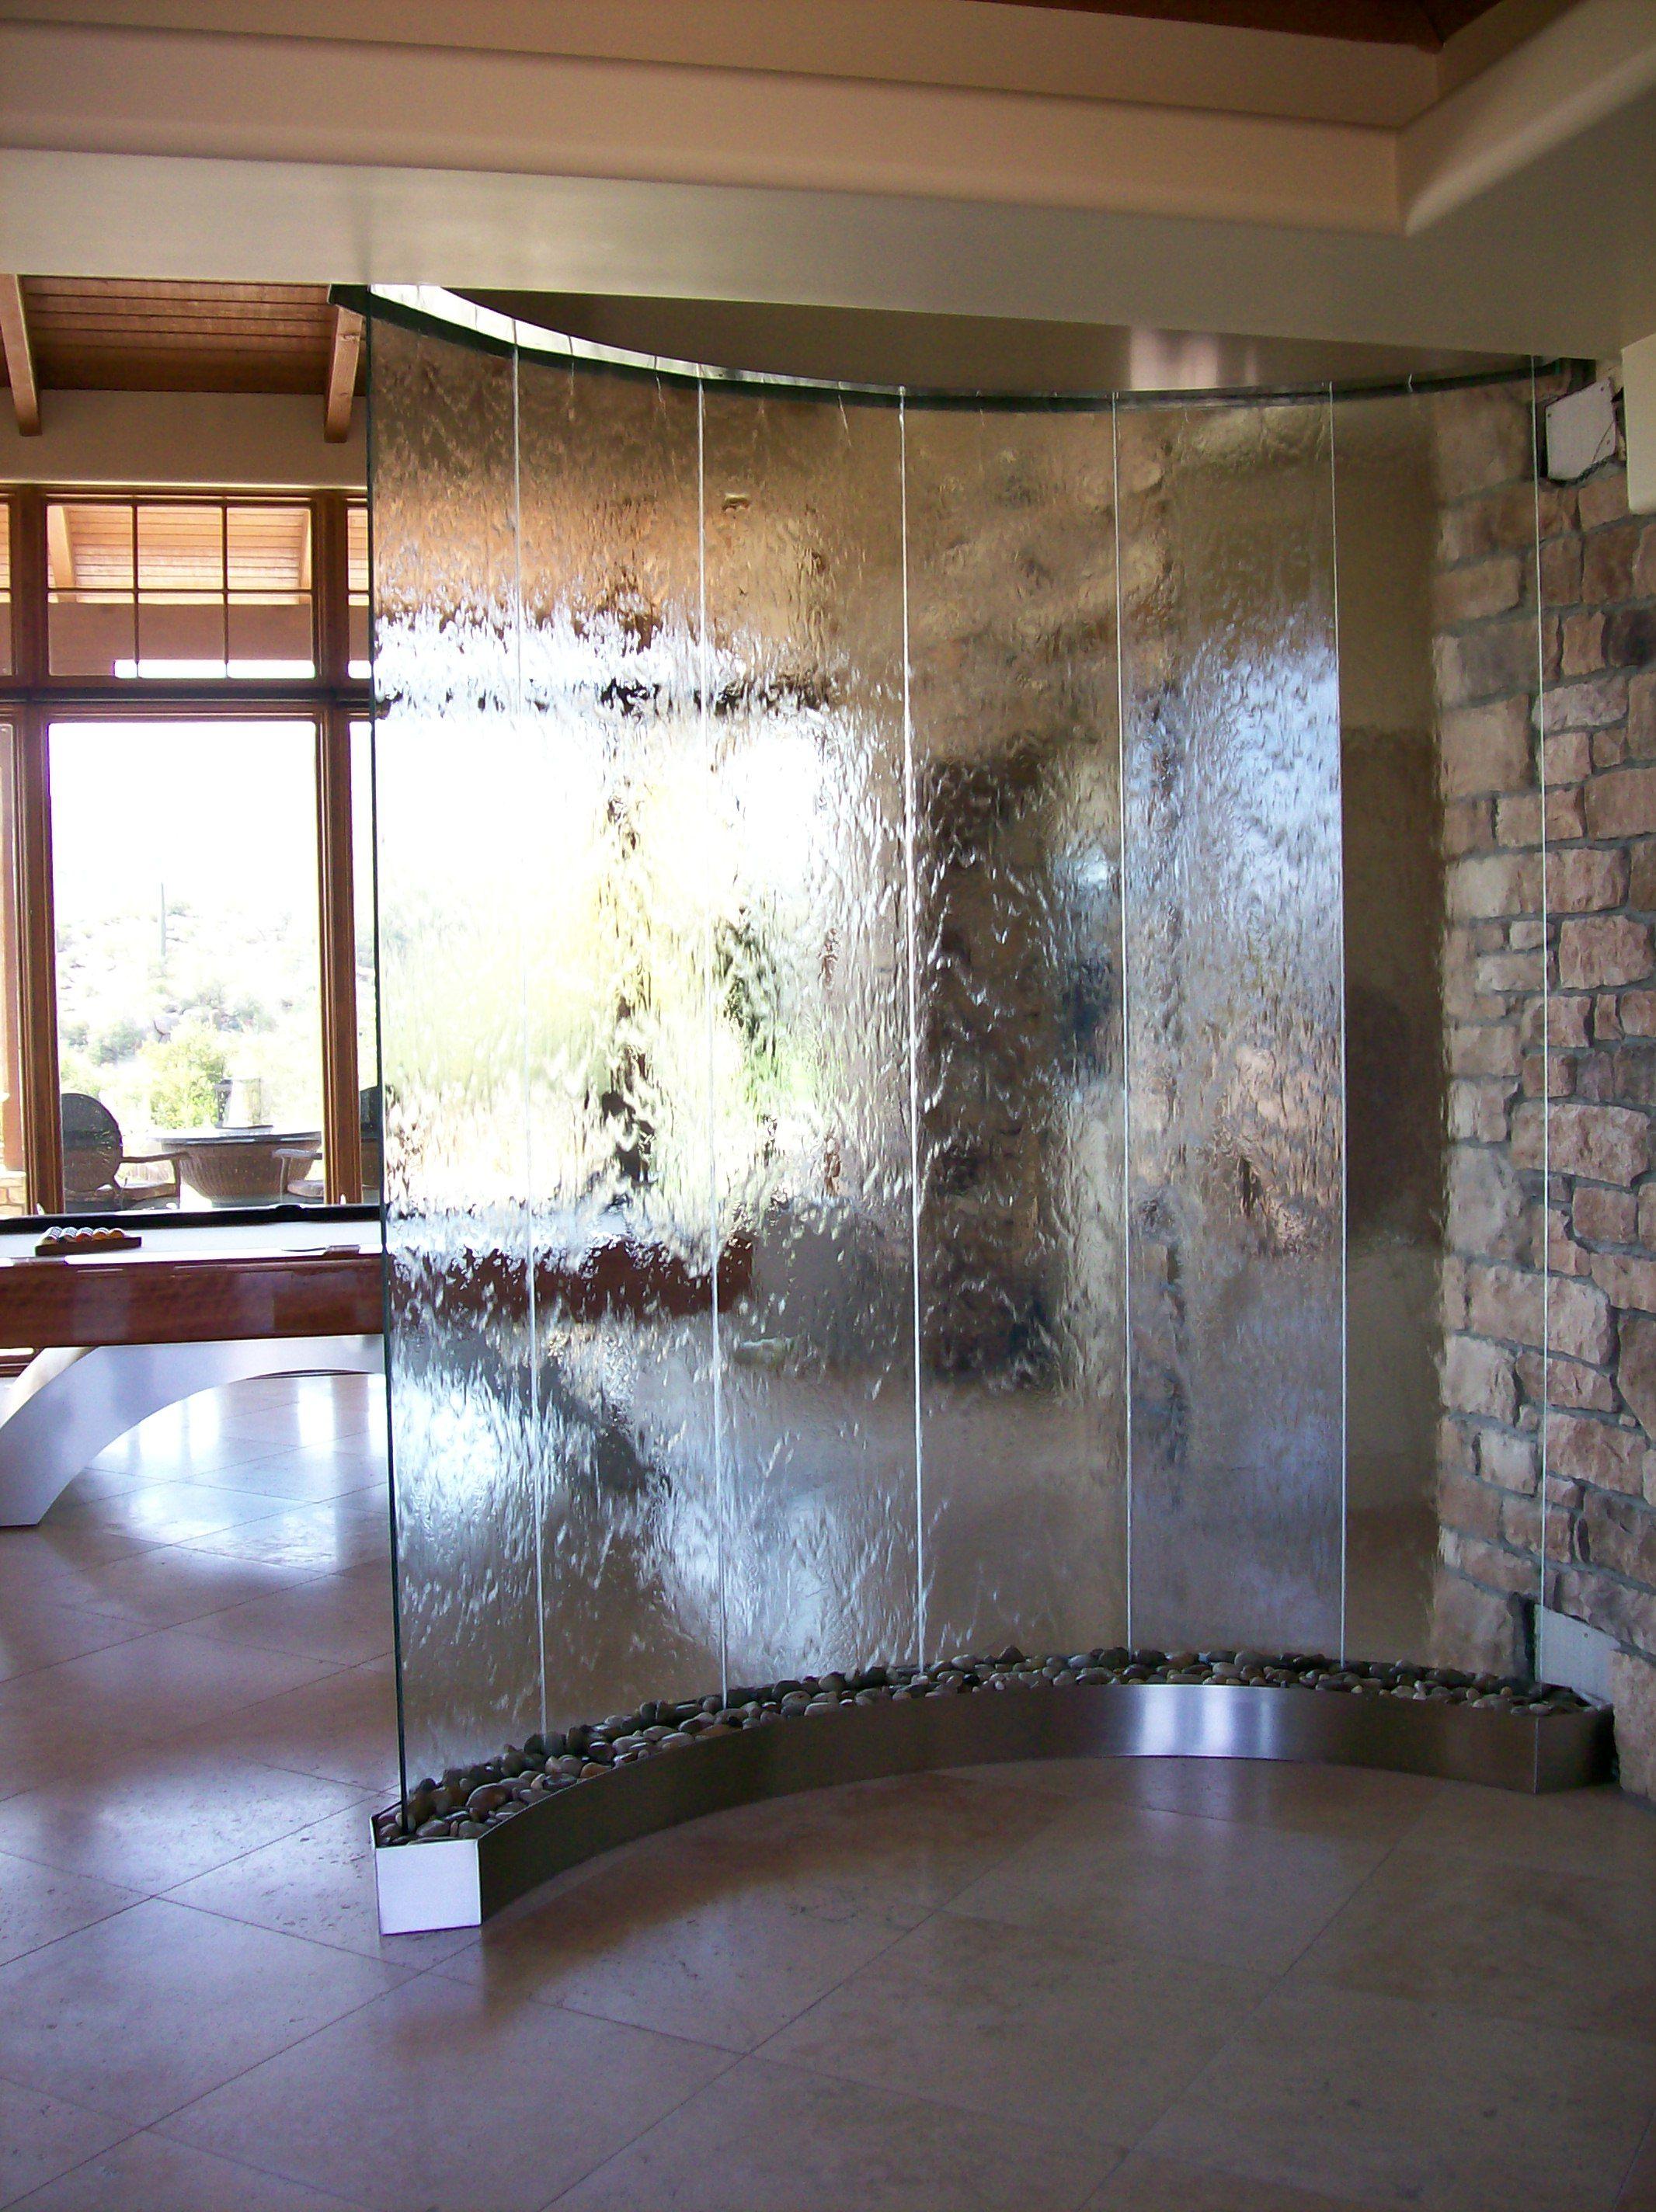 26 water curtain ideas water curtain